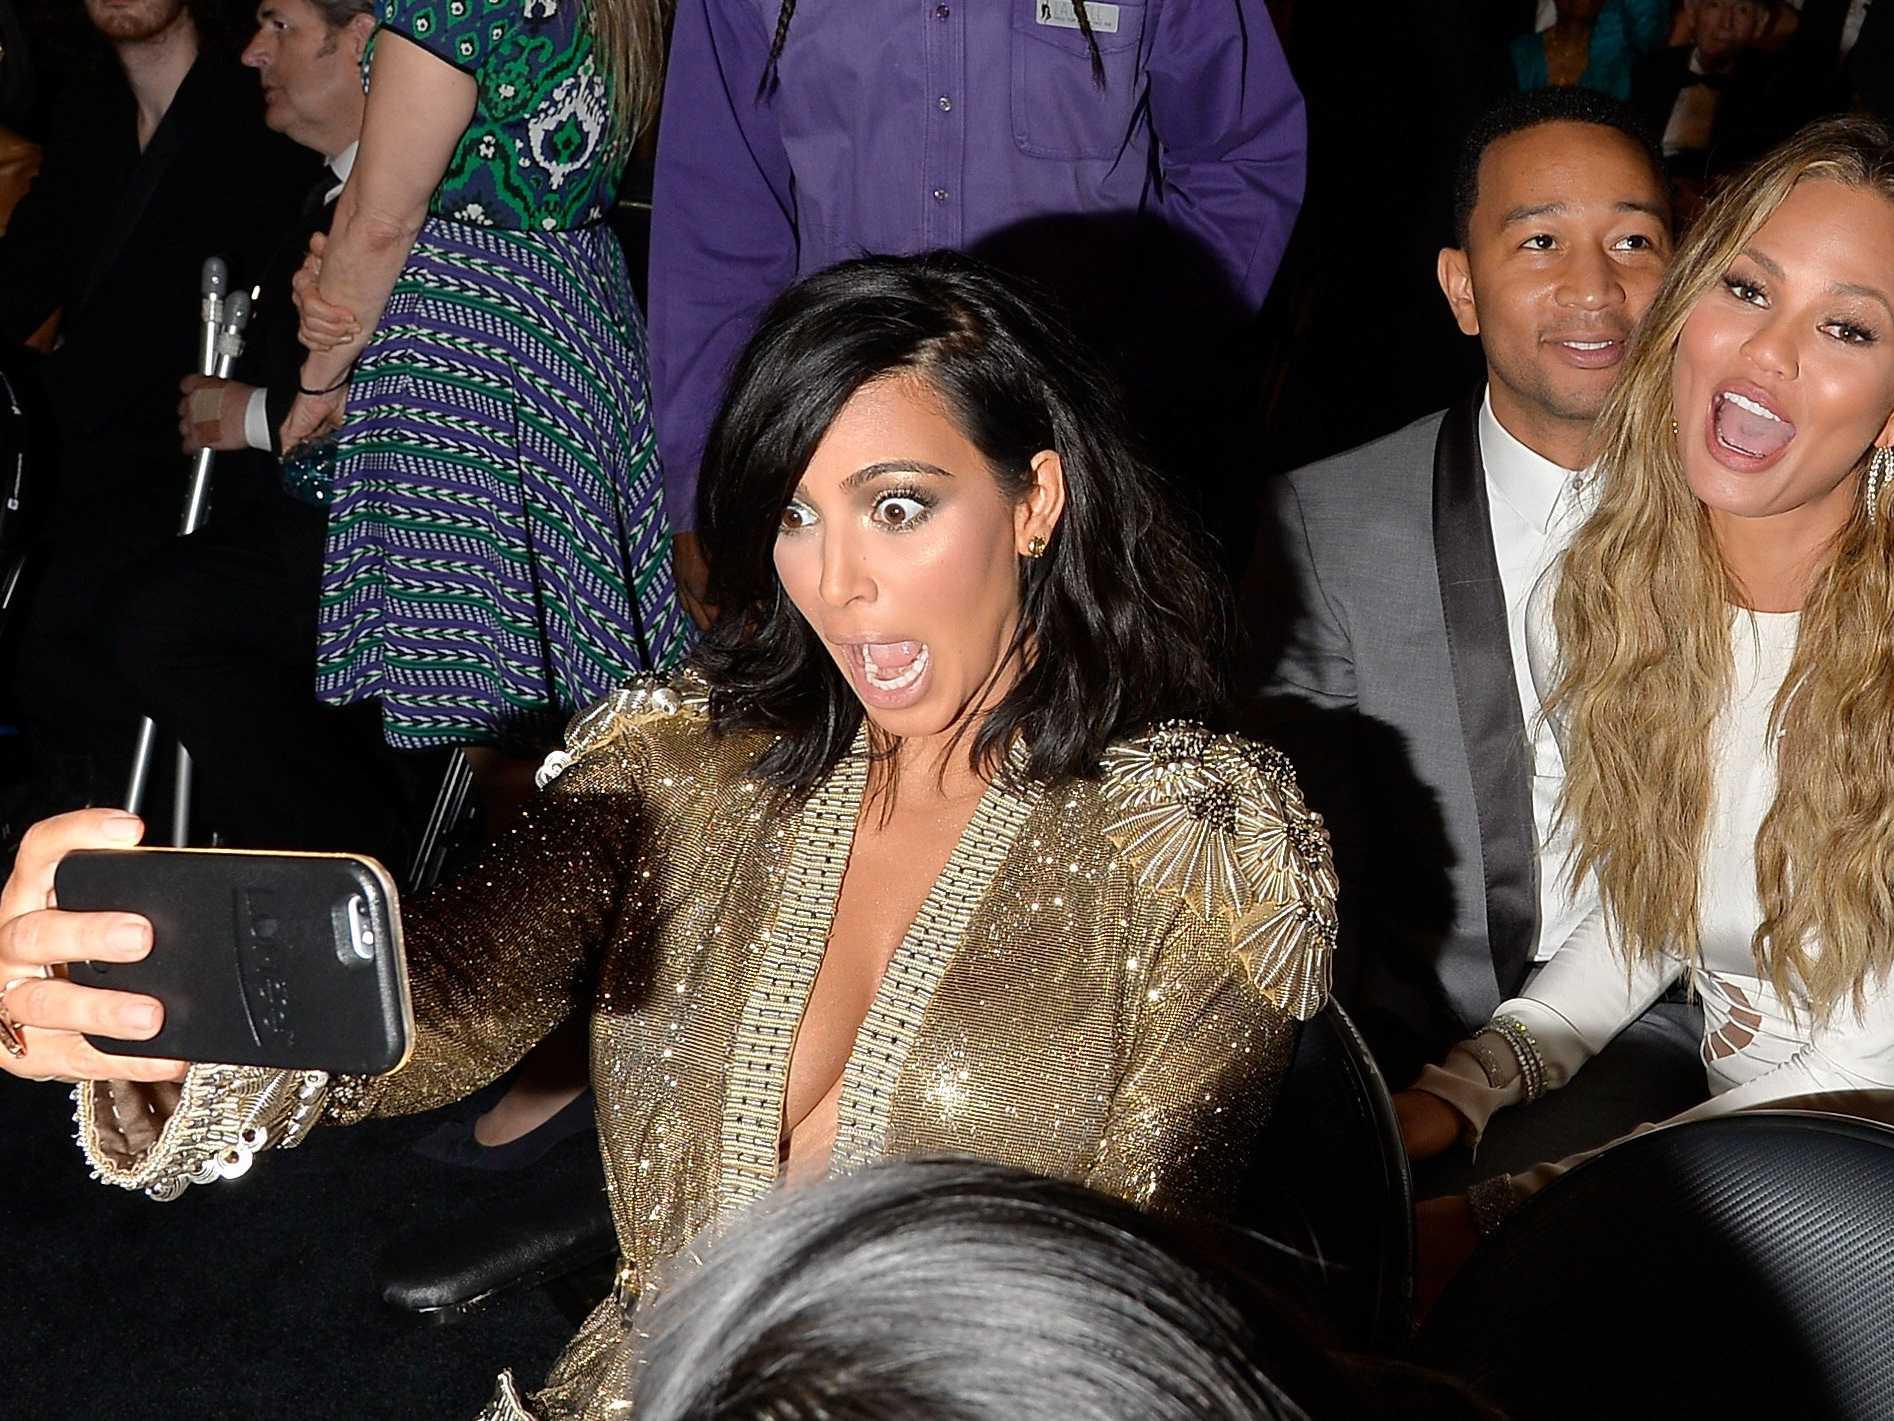 Kim Kardashian is an avid user of The Lumee phone case ;-)